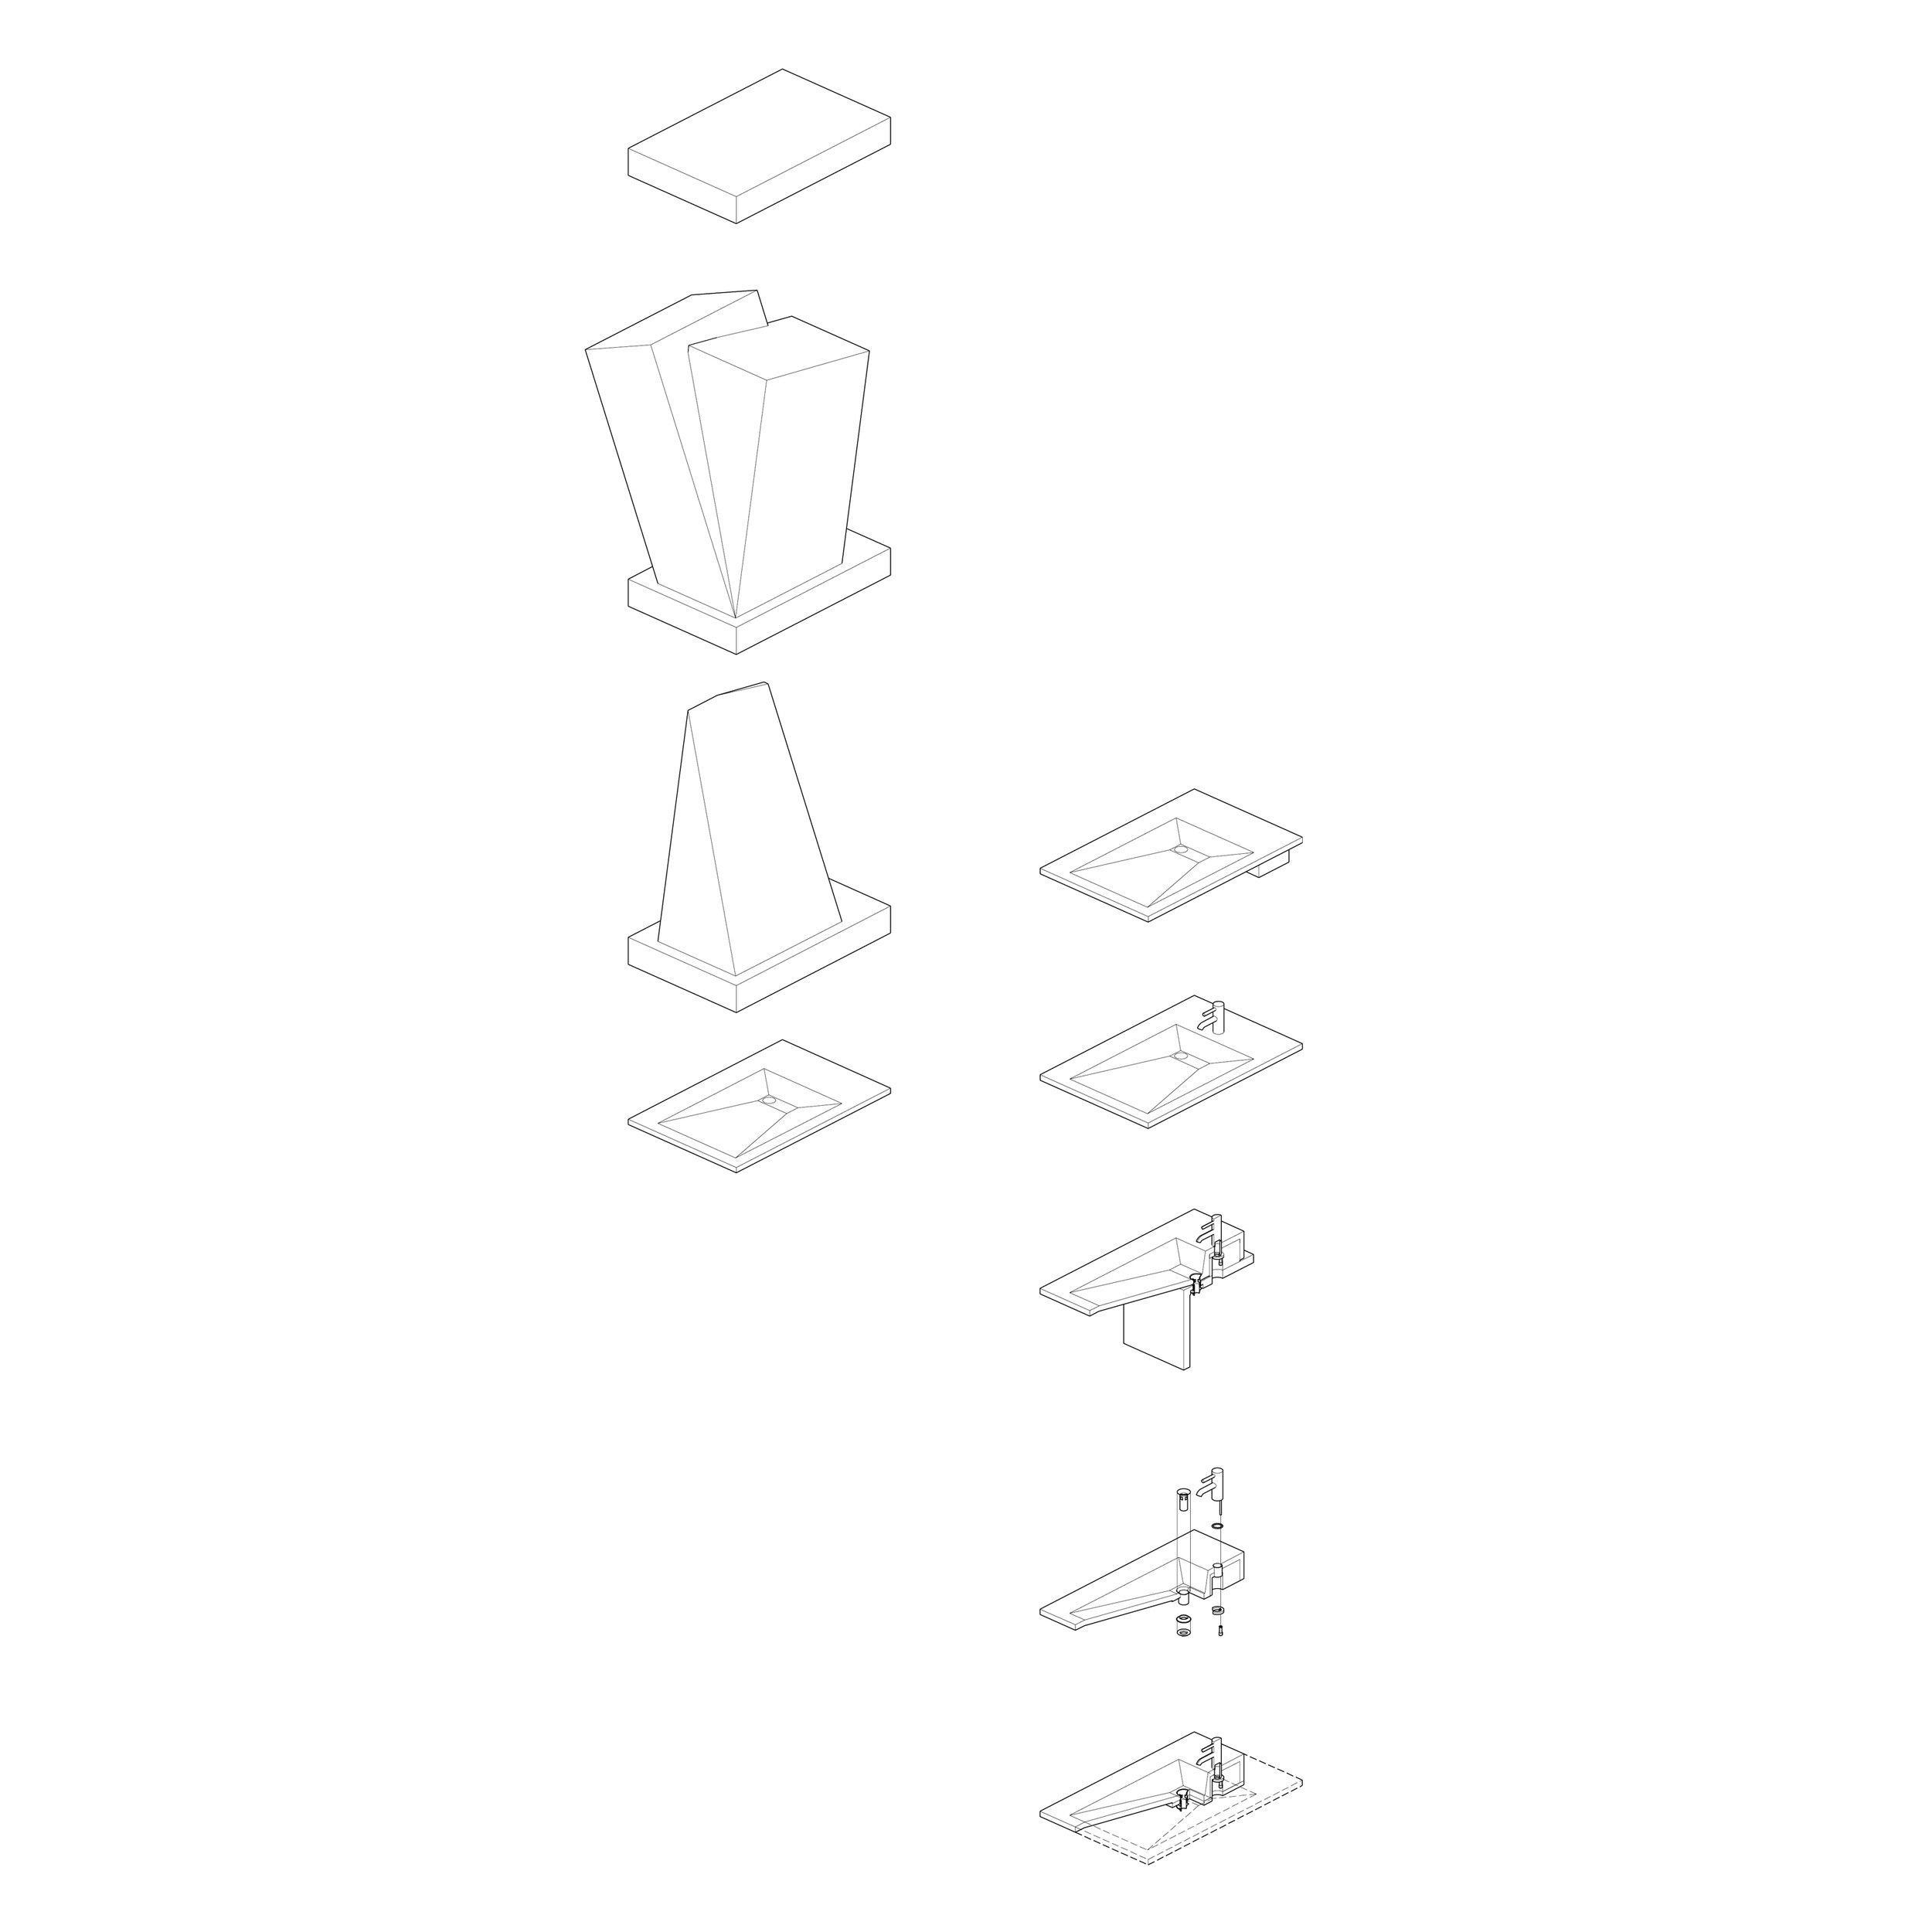 LevyHouse-resin_sink_001_axon.jpg